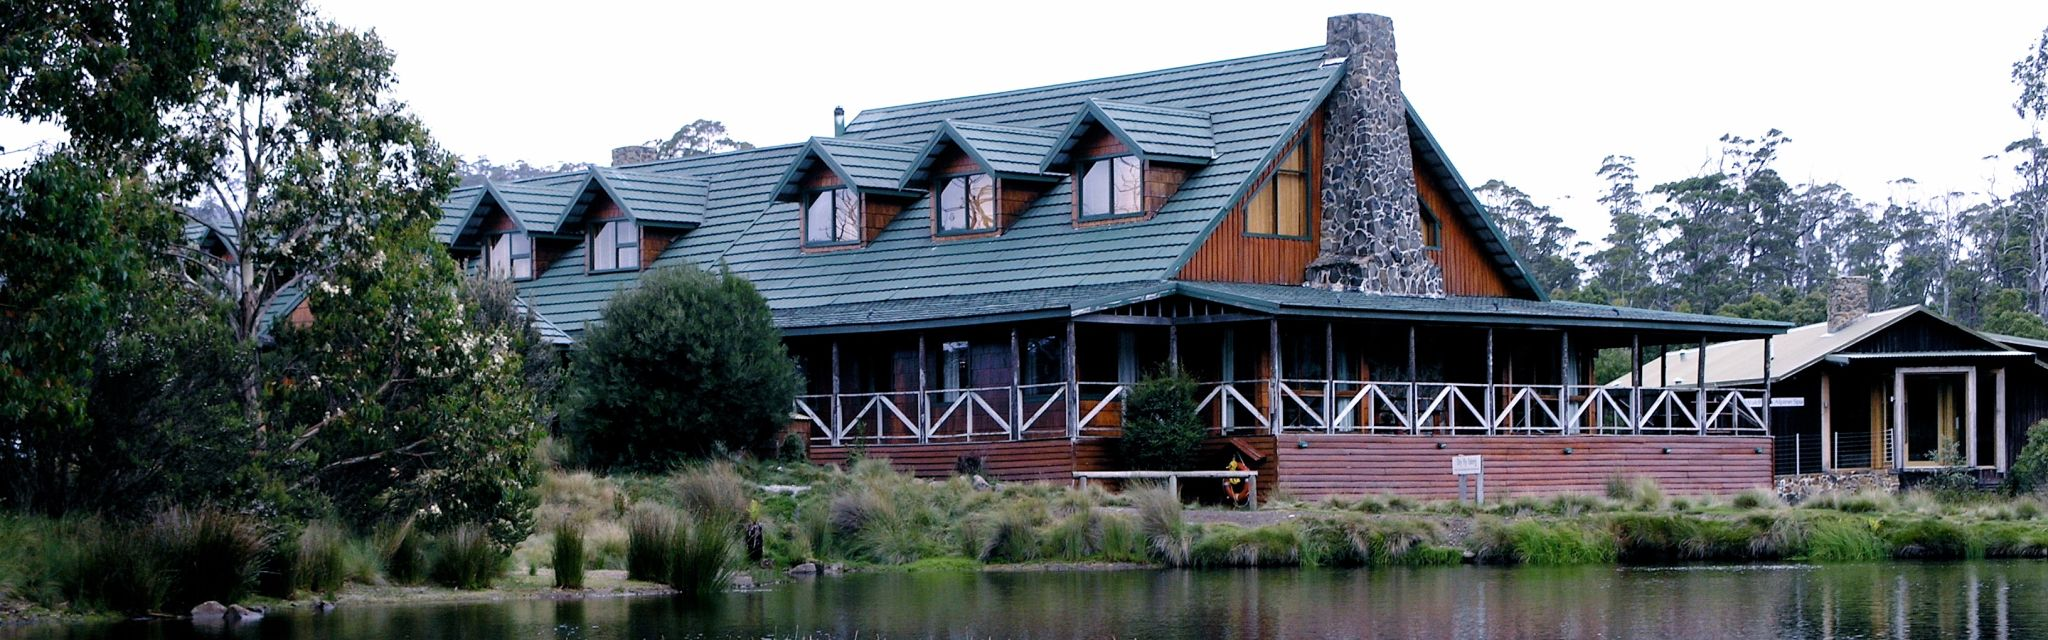 Cradle Mountain Lodge, preferred accommodation on our Tasmania National Parks Tour